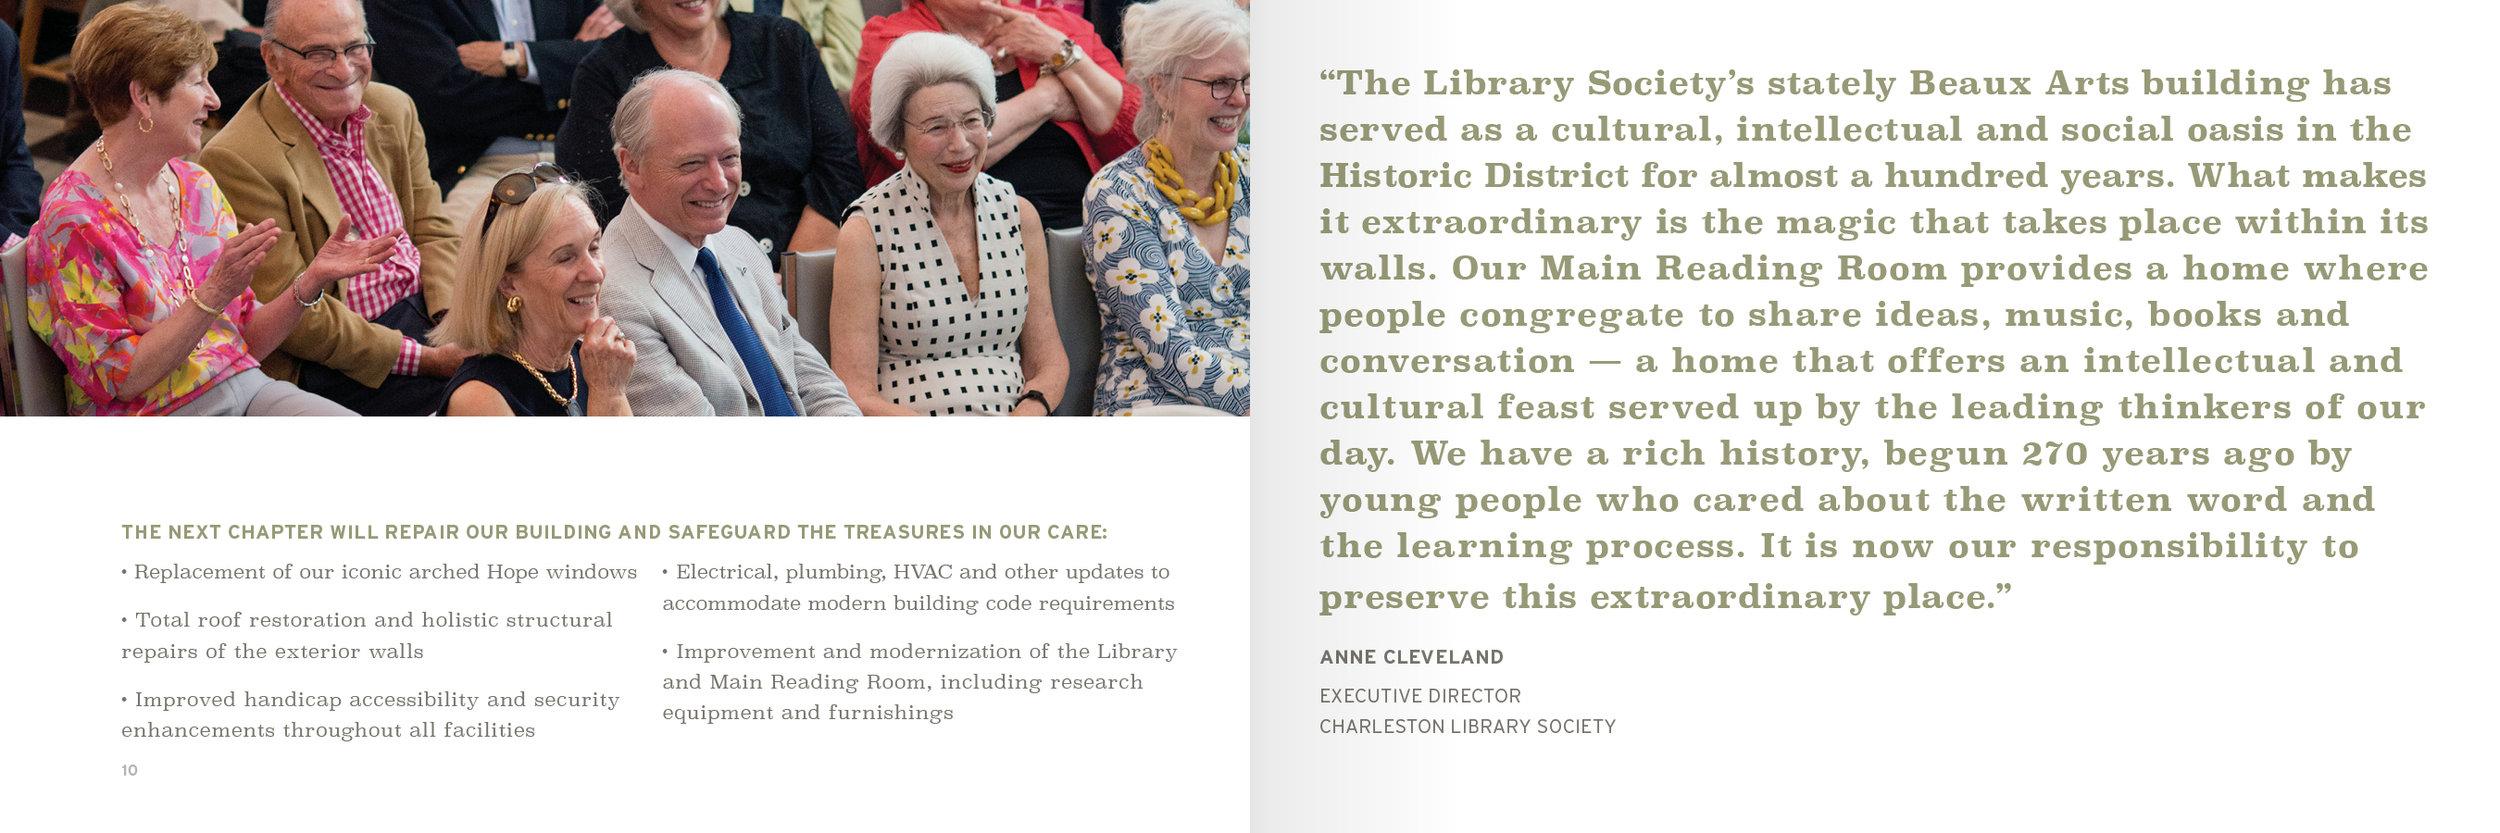 1703023 - Library Society REV6.jpg